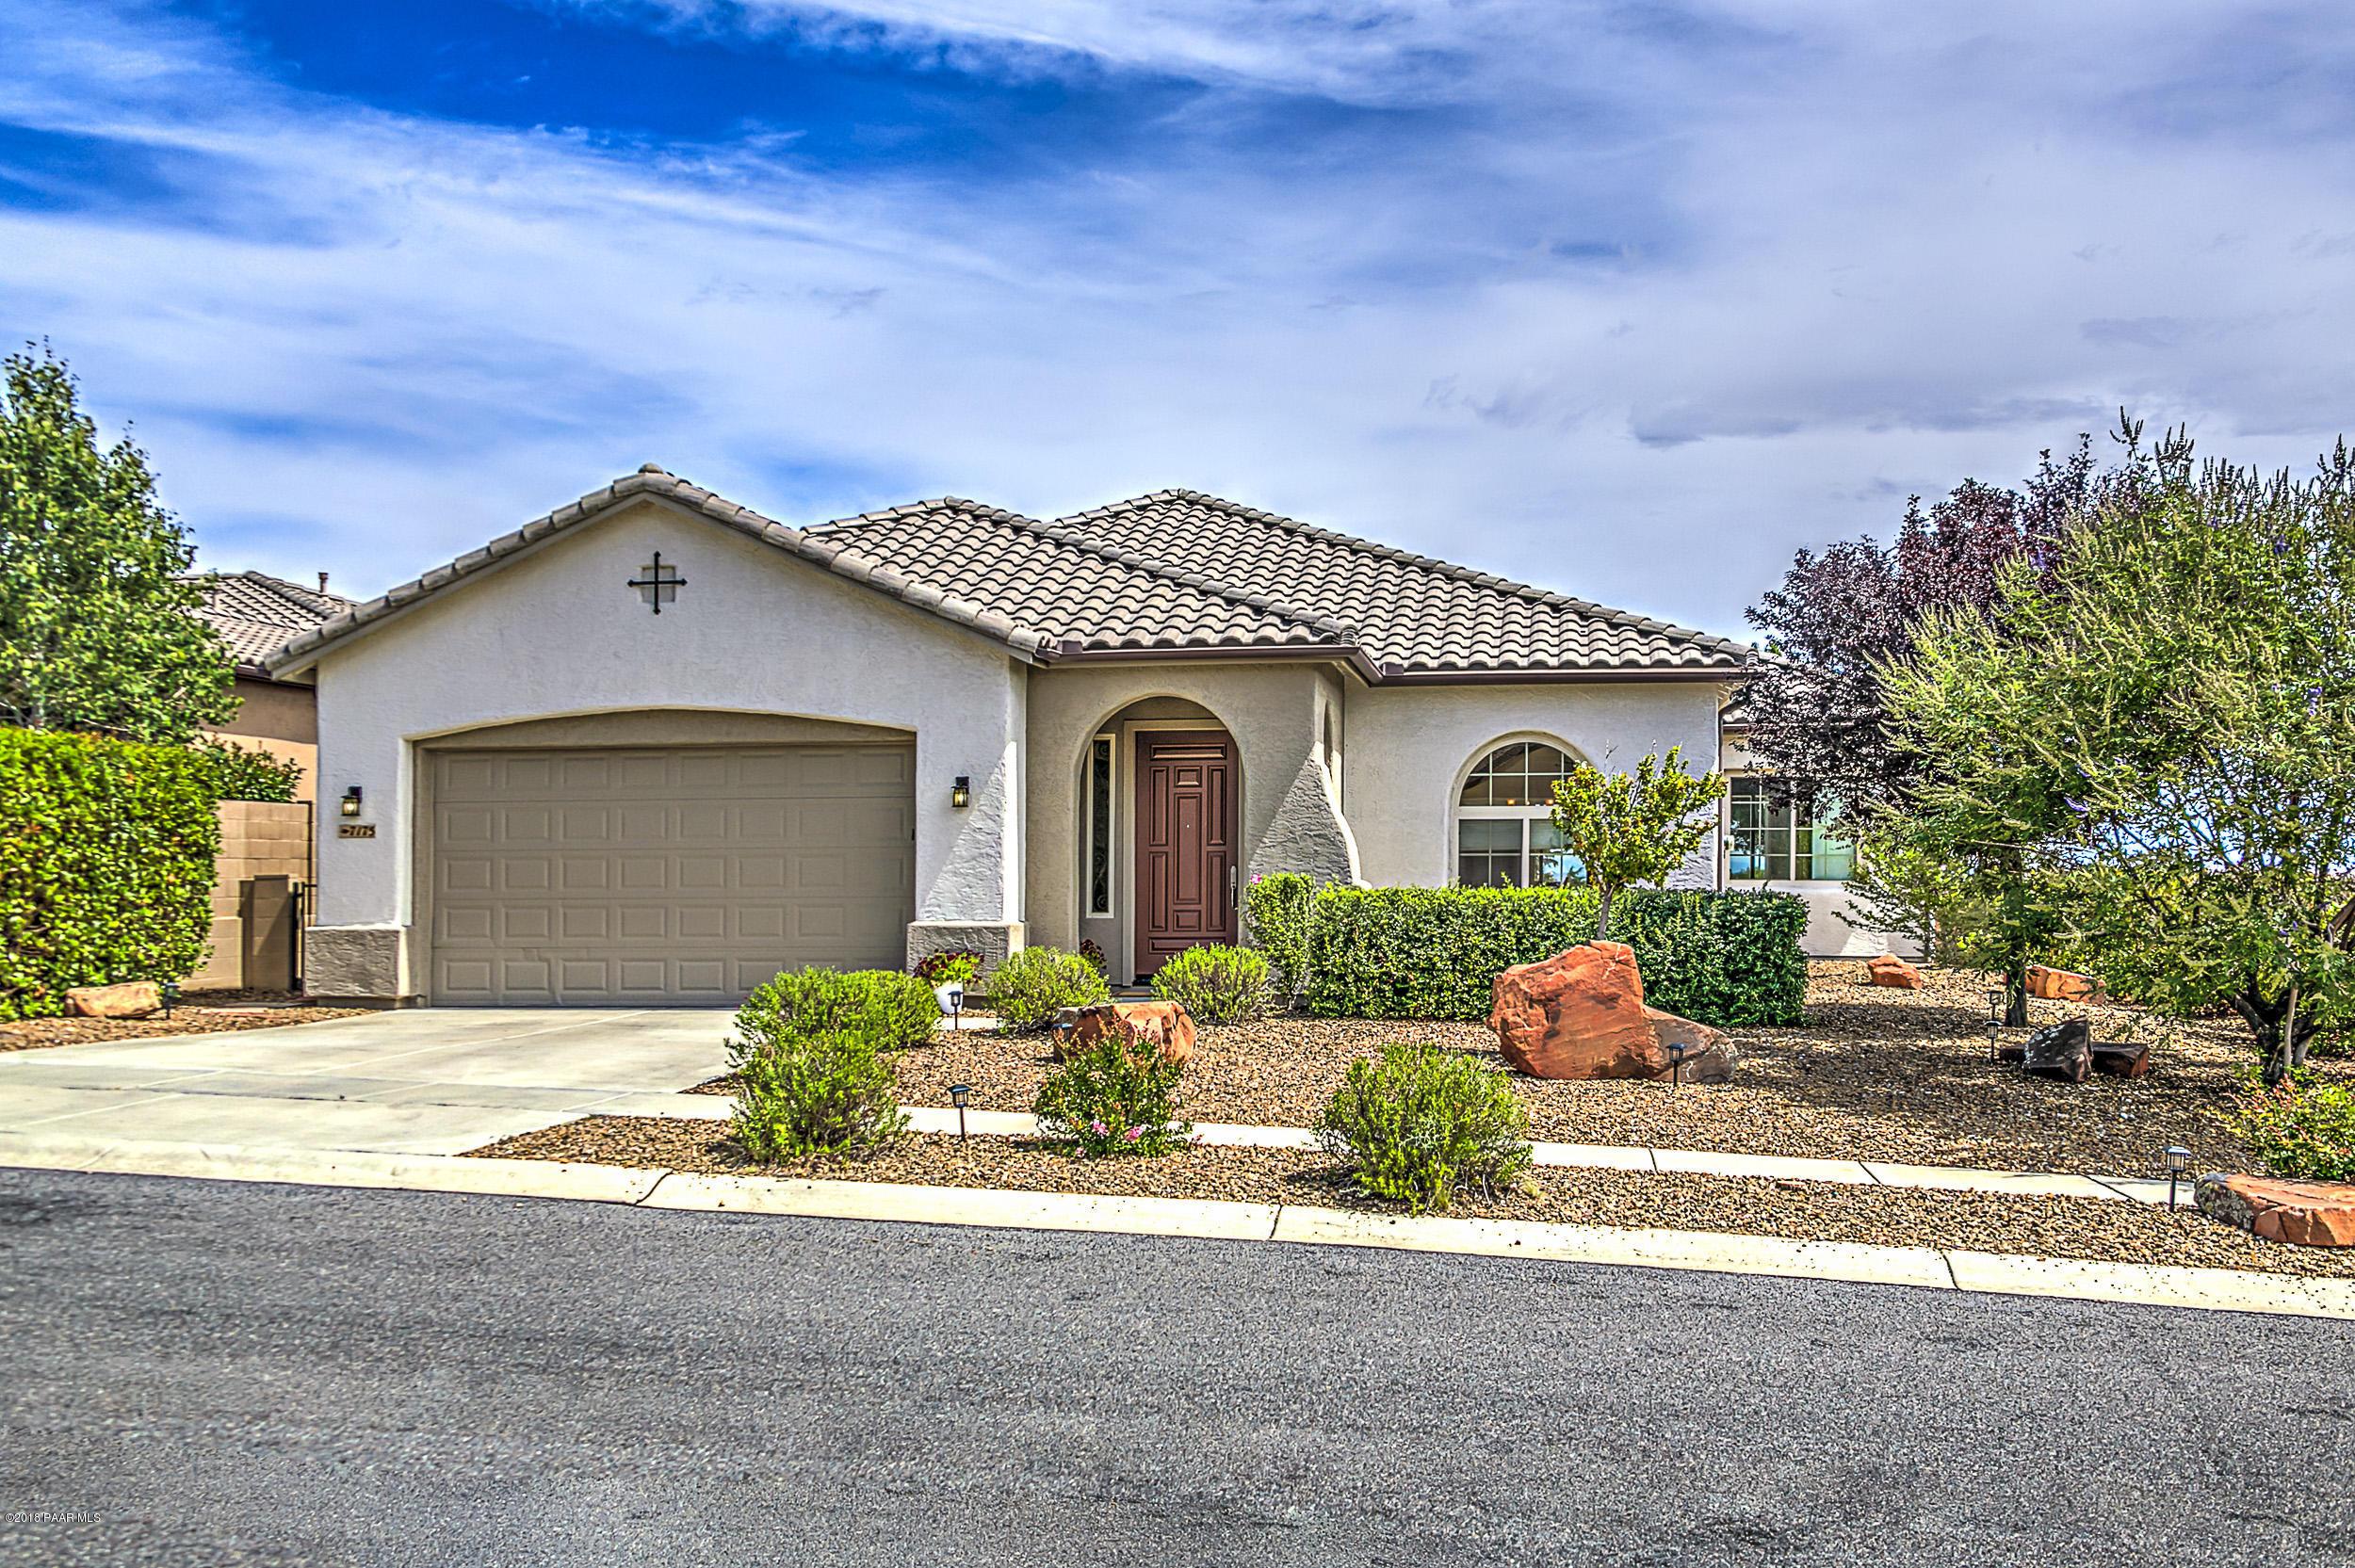 Photo of 7175 Sienna Springs, Prescott Valley, AZ 86314